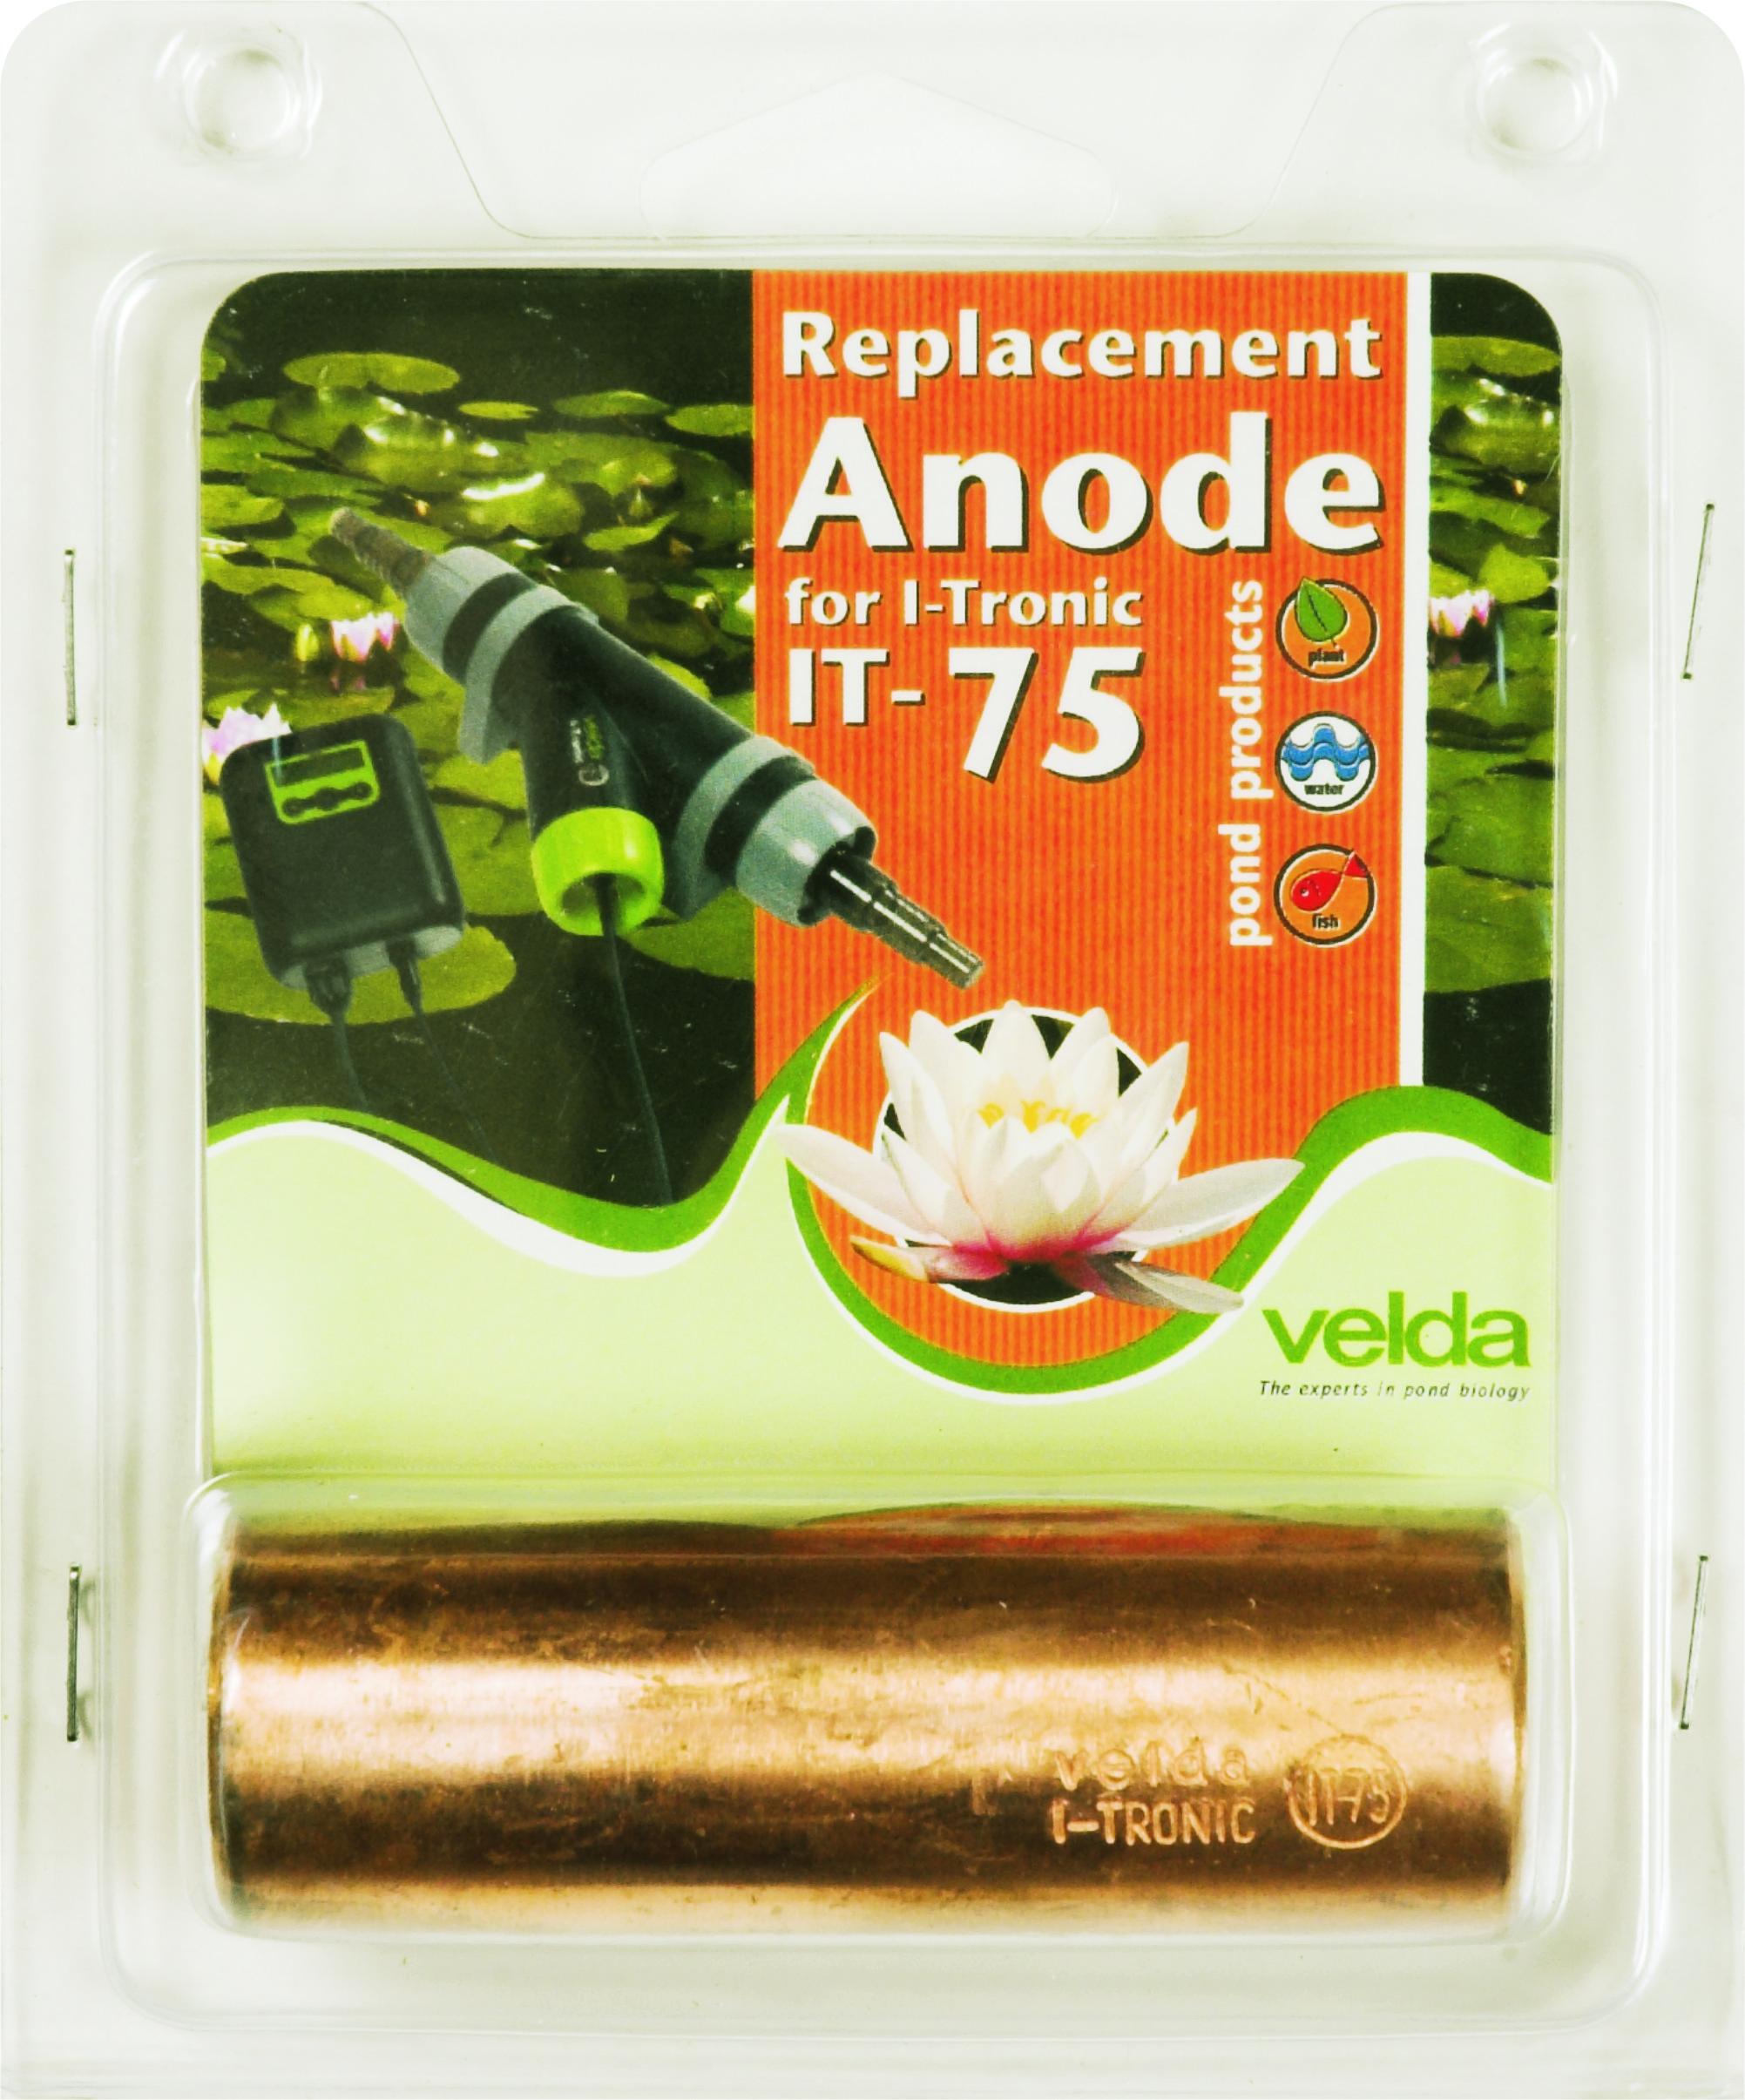 VELDA ANODE I-TRONIC IT-75 - T-FLOW 75